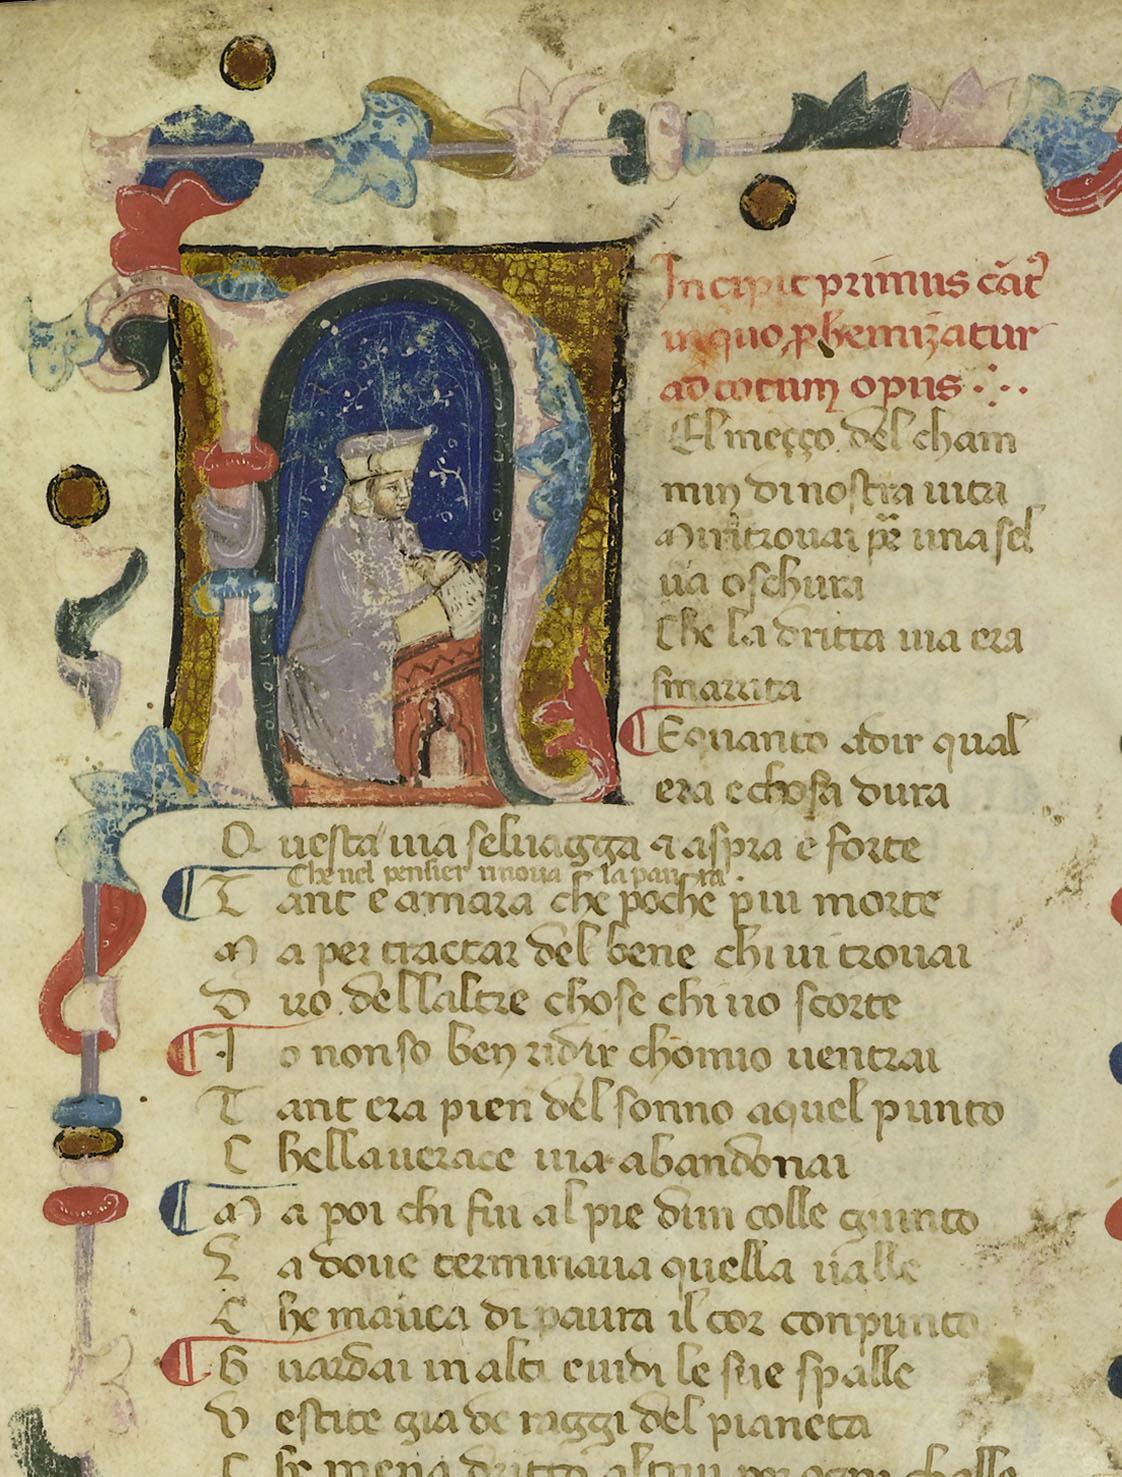 """Digital Editing and Medieval Manuscripts"" (Venezia, 3"